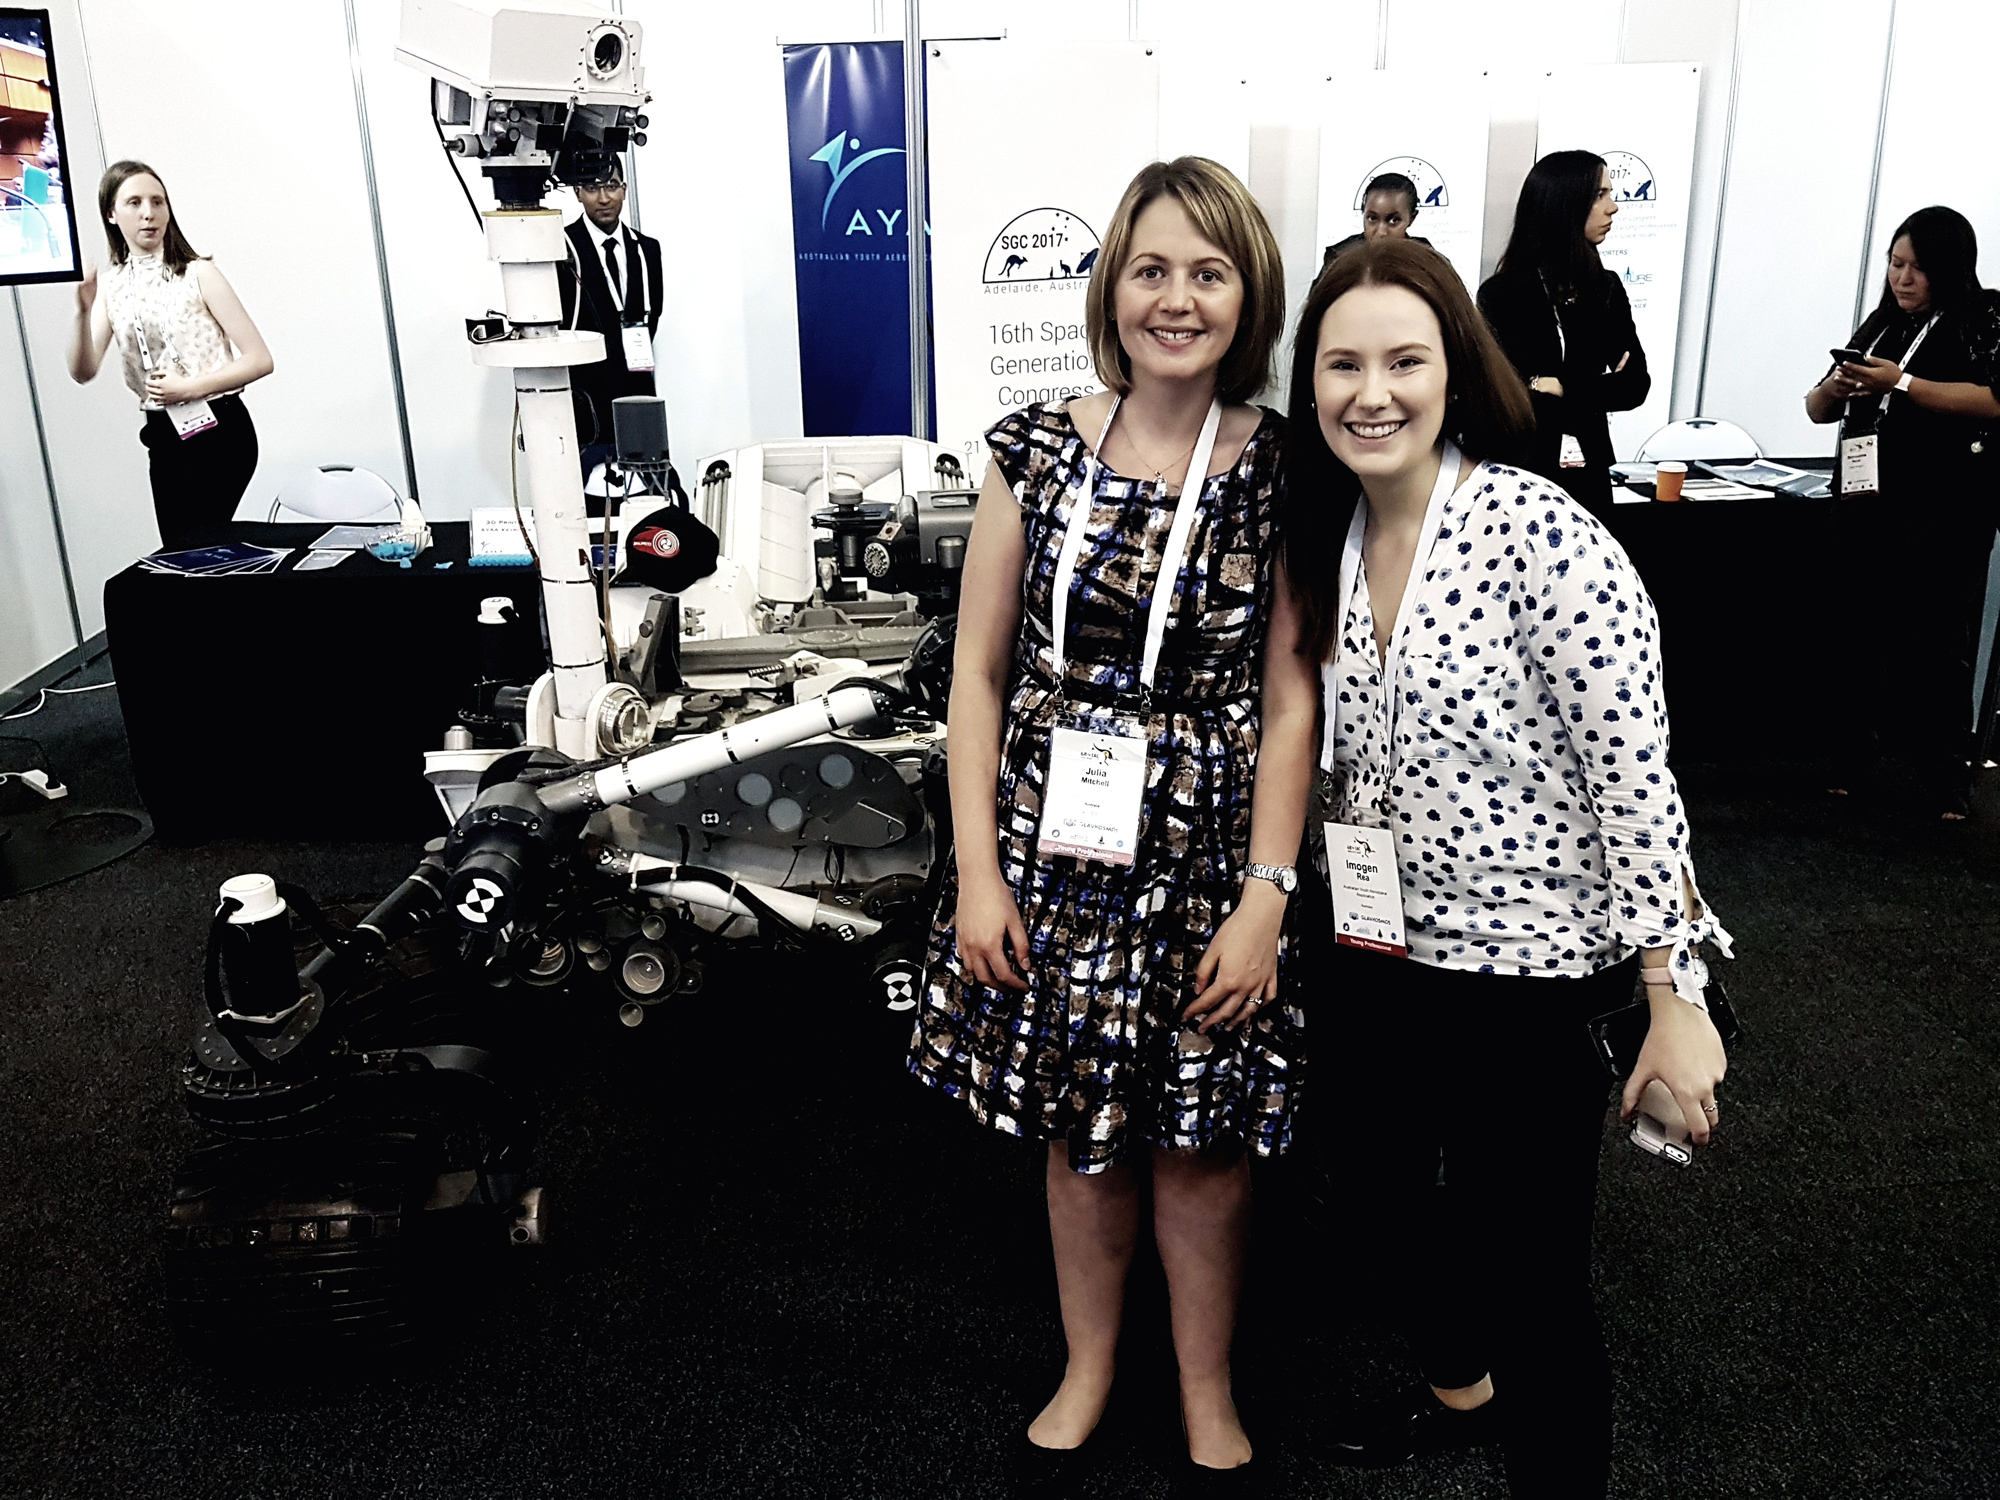 Julia Mitchell, SBAS Test-Bed Program Manager, FrontierSI